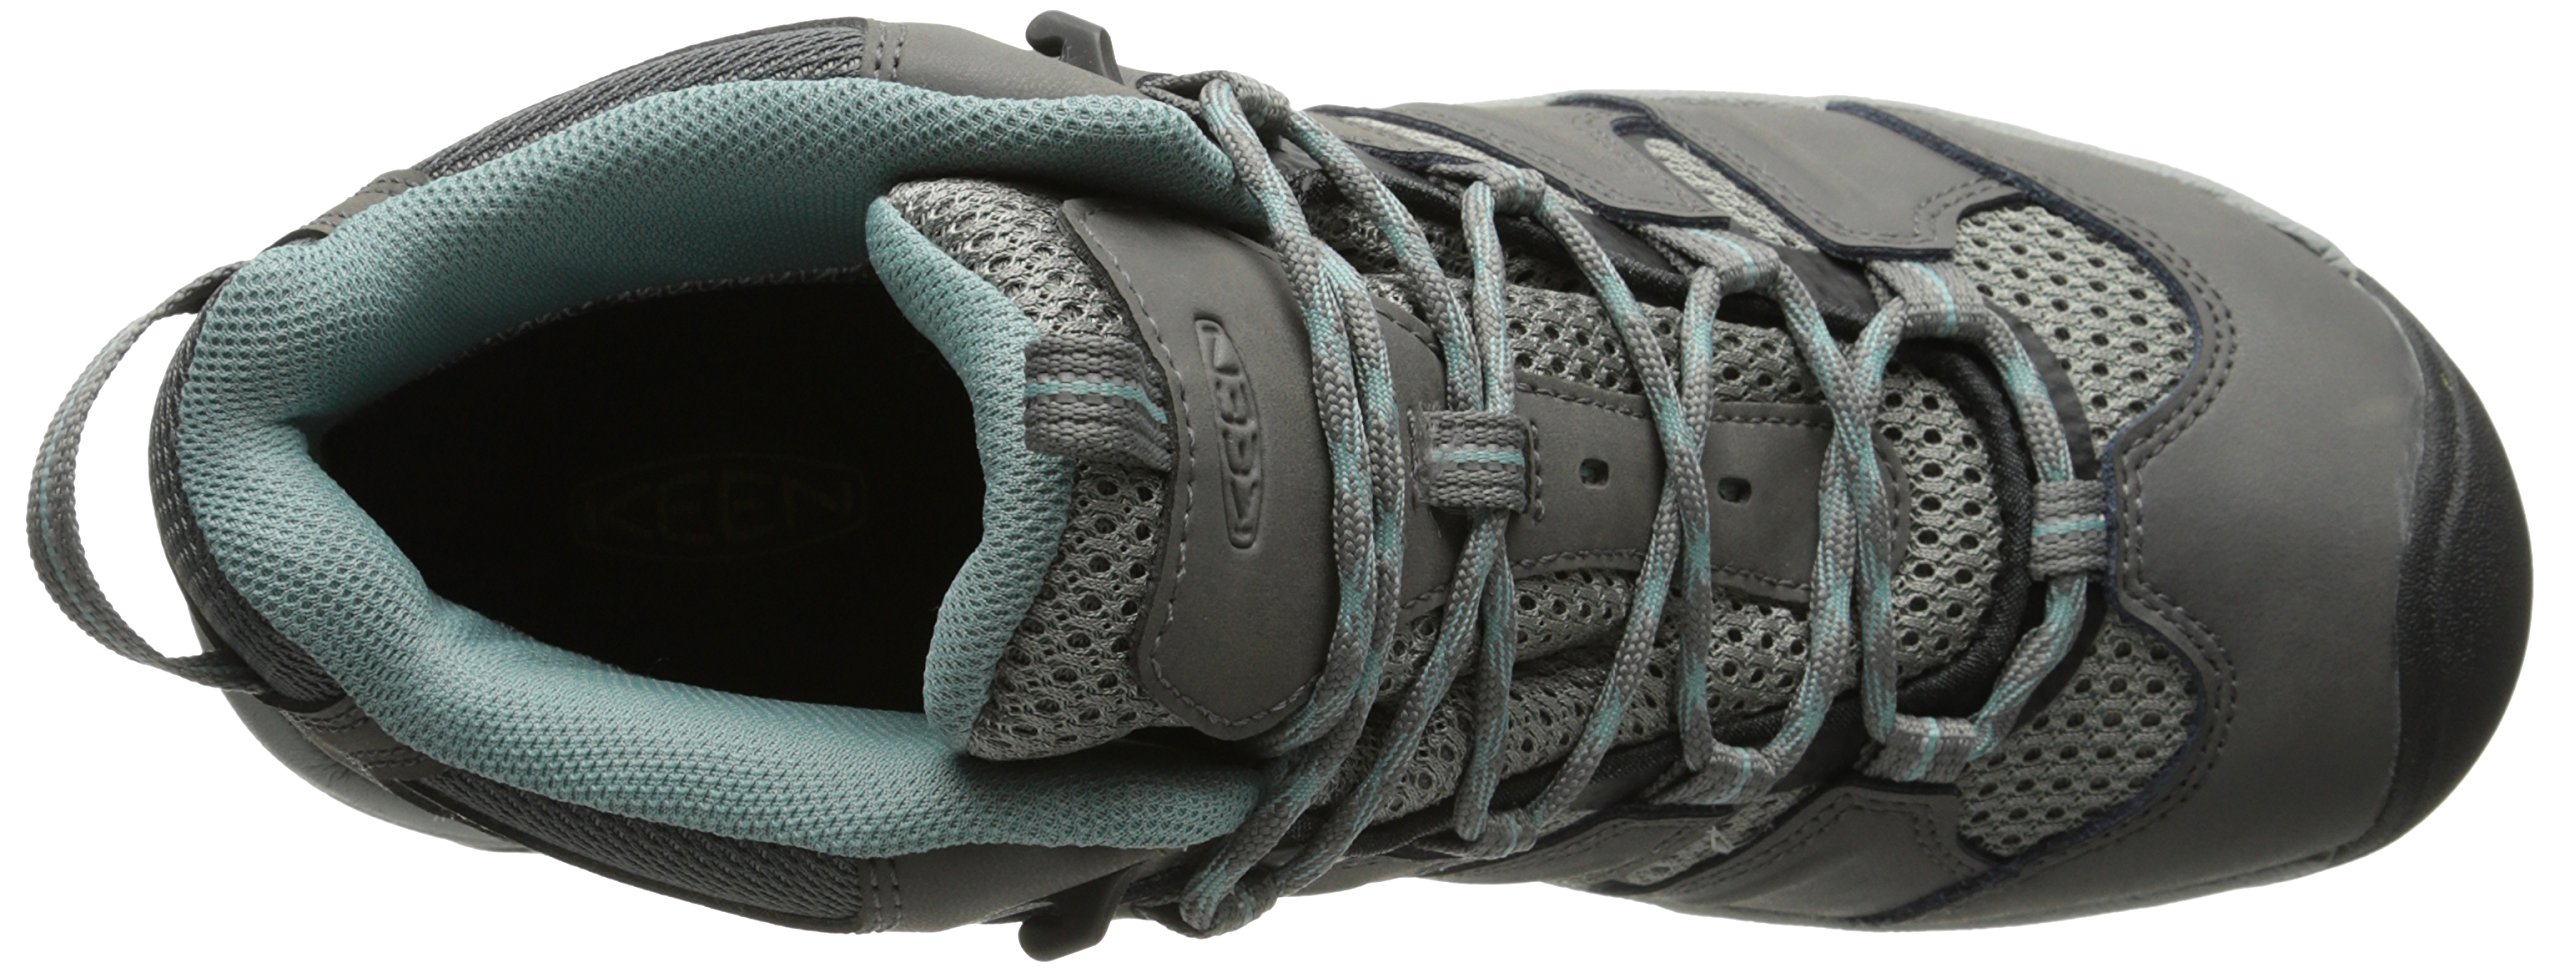 KEEN Women's Koven Mid Waterproof Outdoor Boot, Gargoyle/Mineral Blue, 8 M US by KEEN (Image #8)